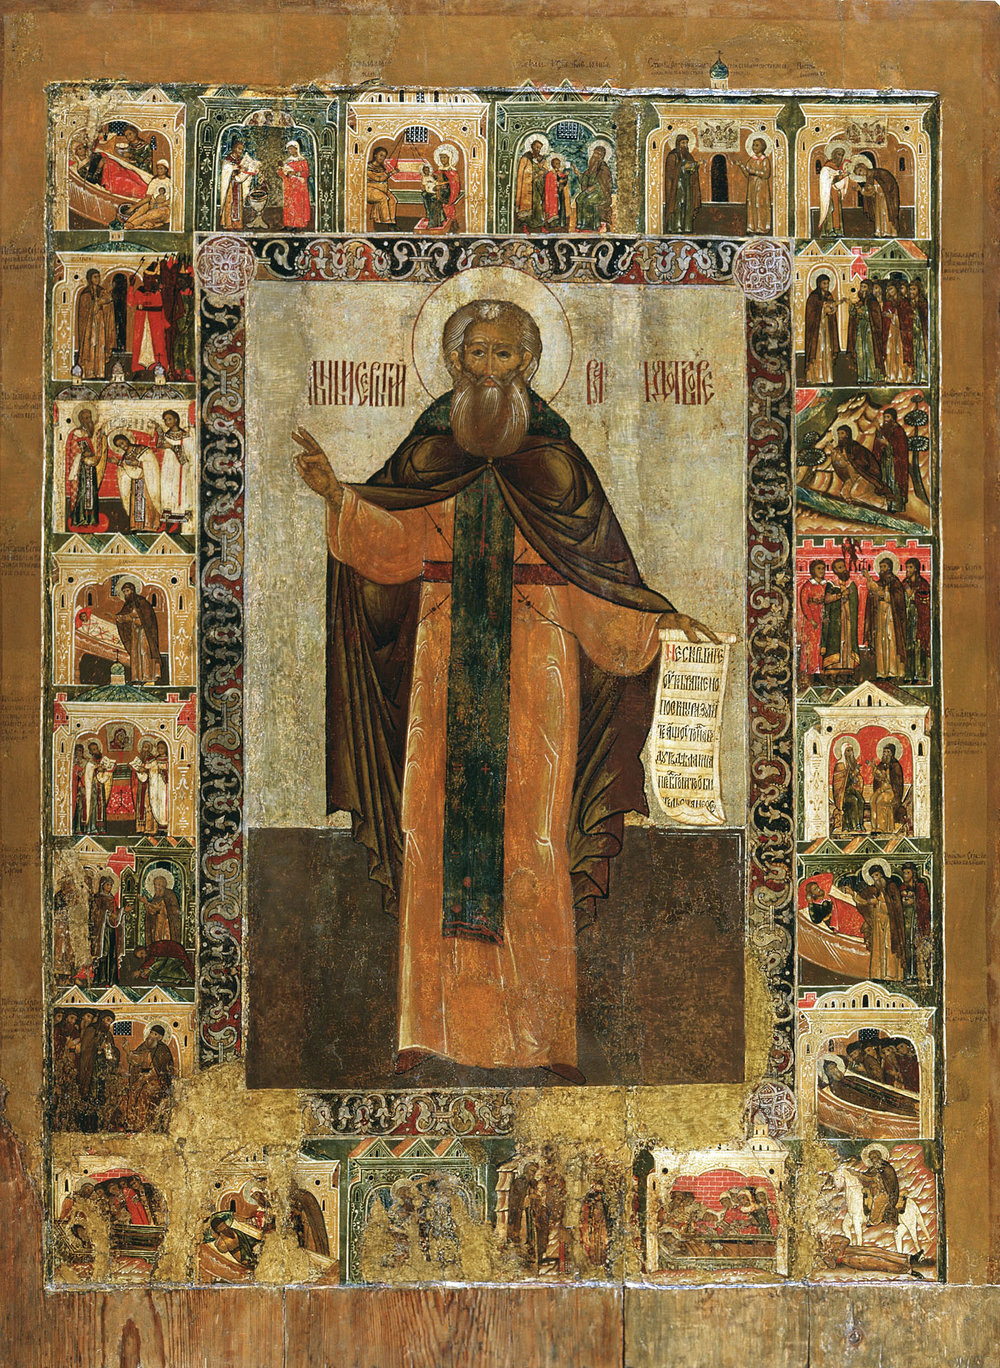 St. Sergios of Radnozeh